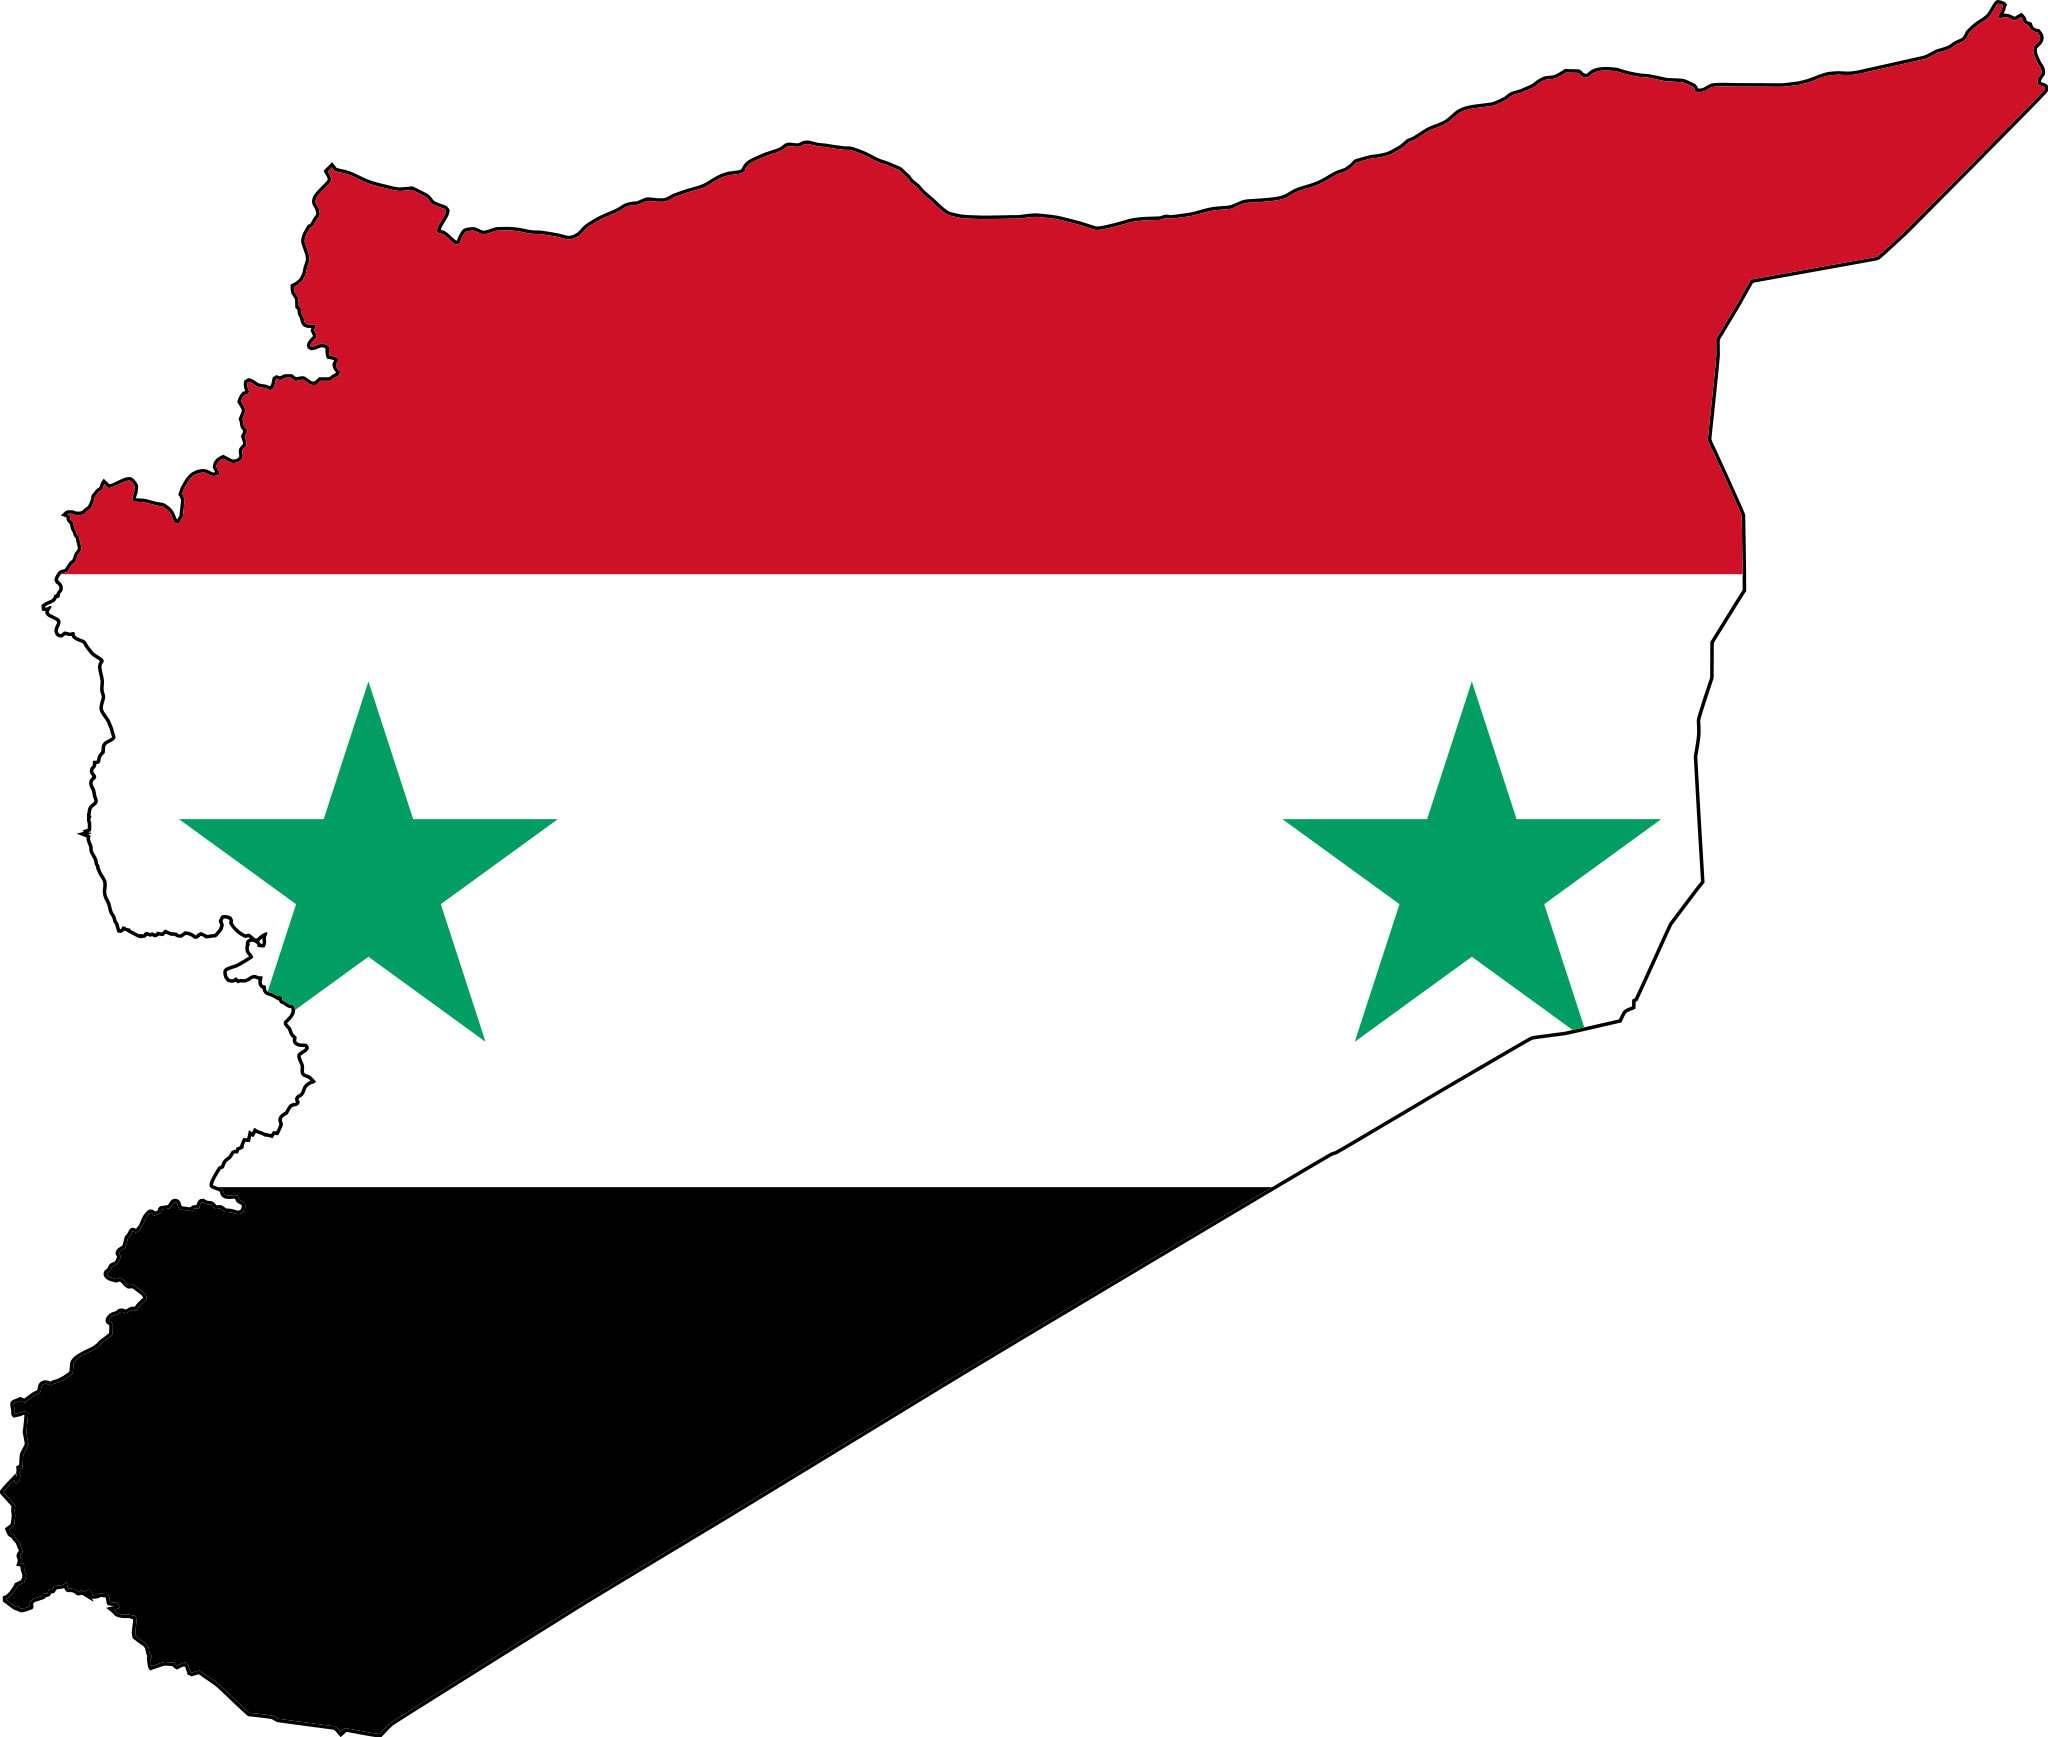 Syria: Airstrike on School Kills Civilians